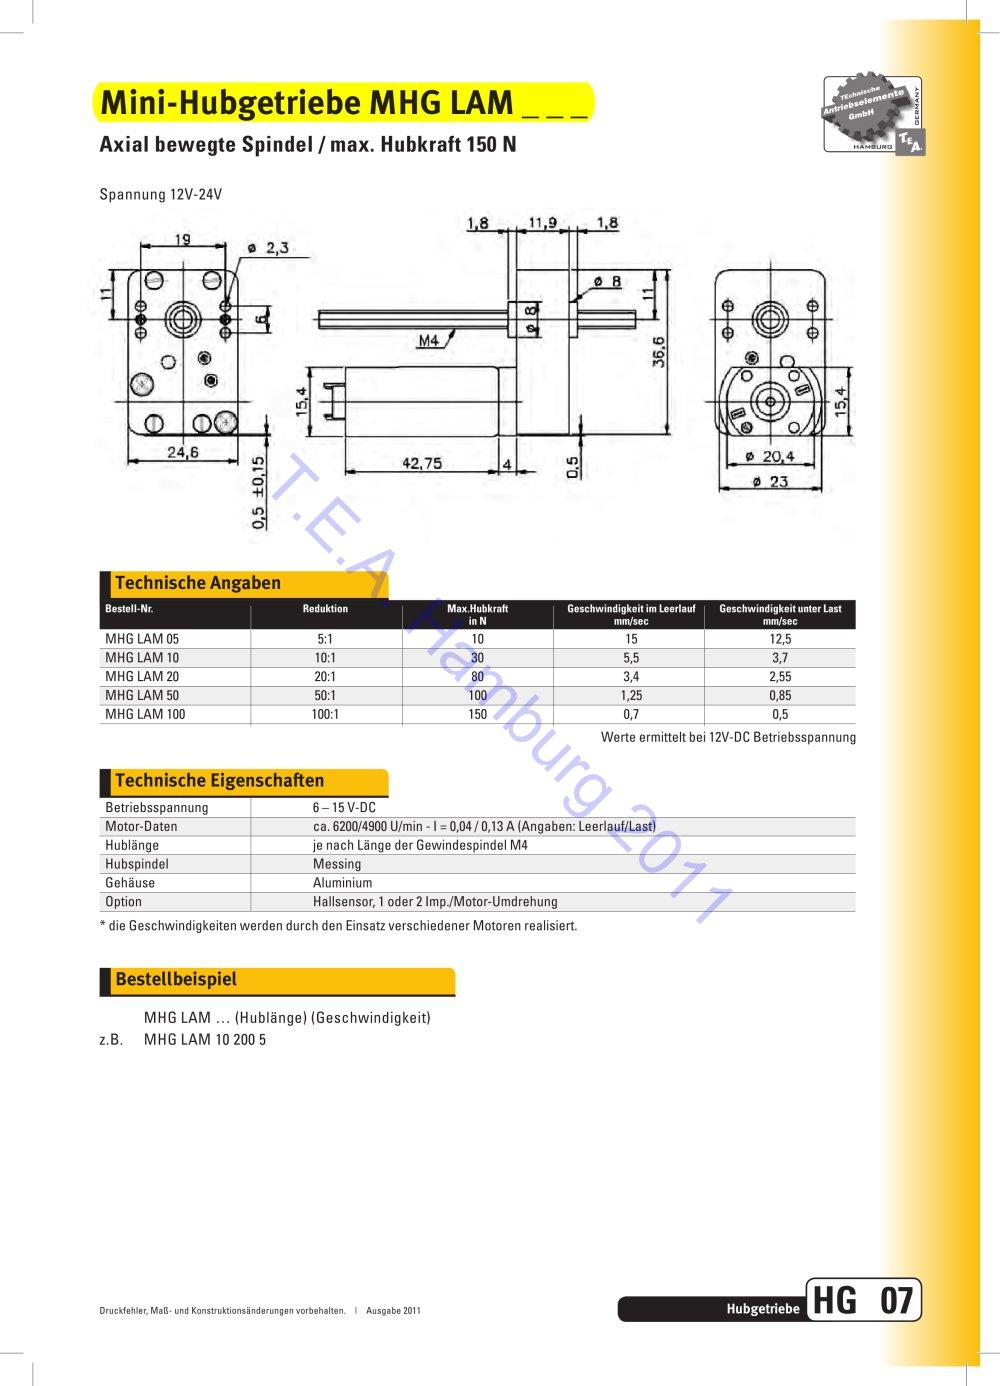 Mini-Hubgetriebe MHG LAM - Technische Antriebselemente GmbH - PDF ...